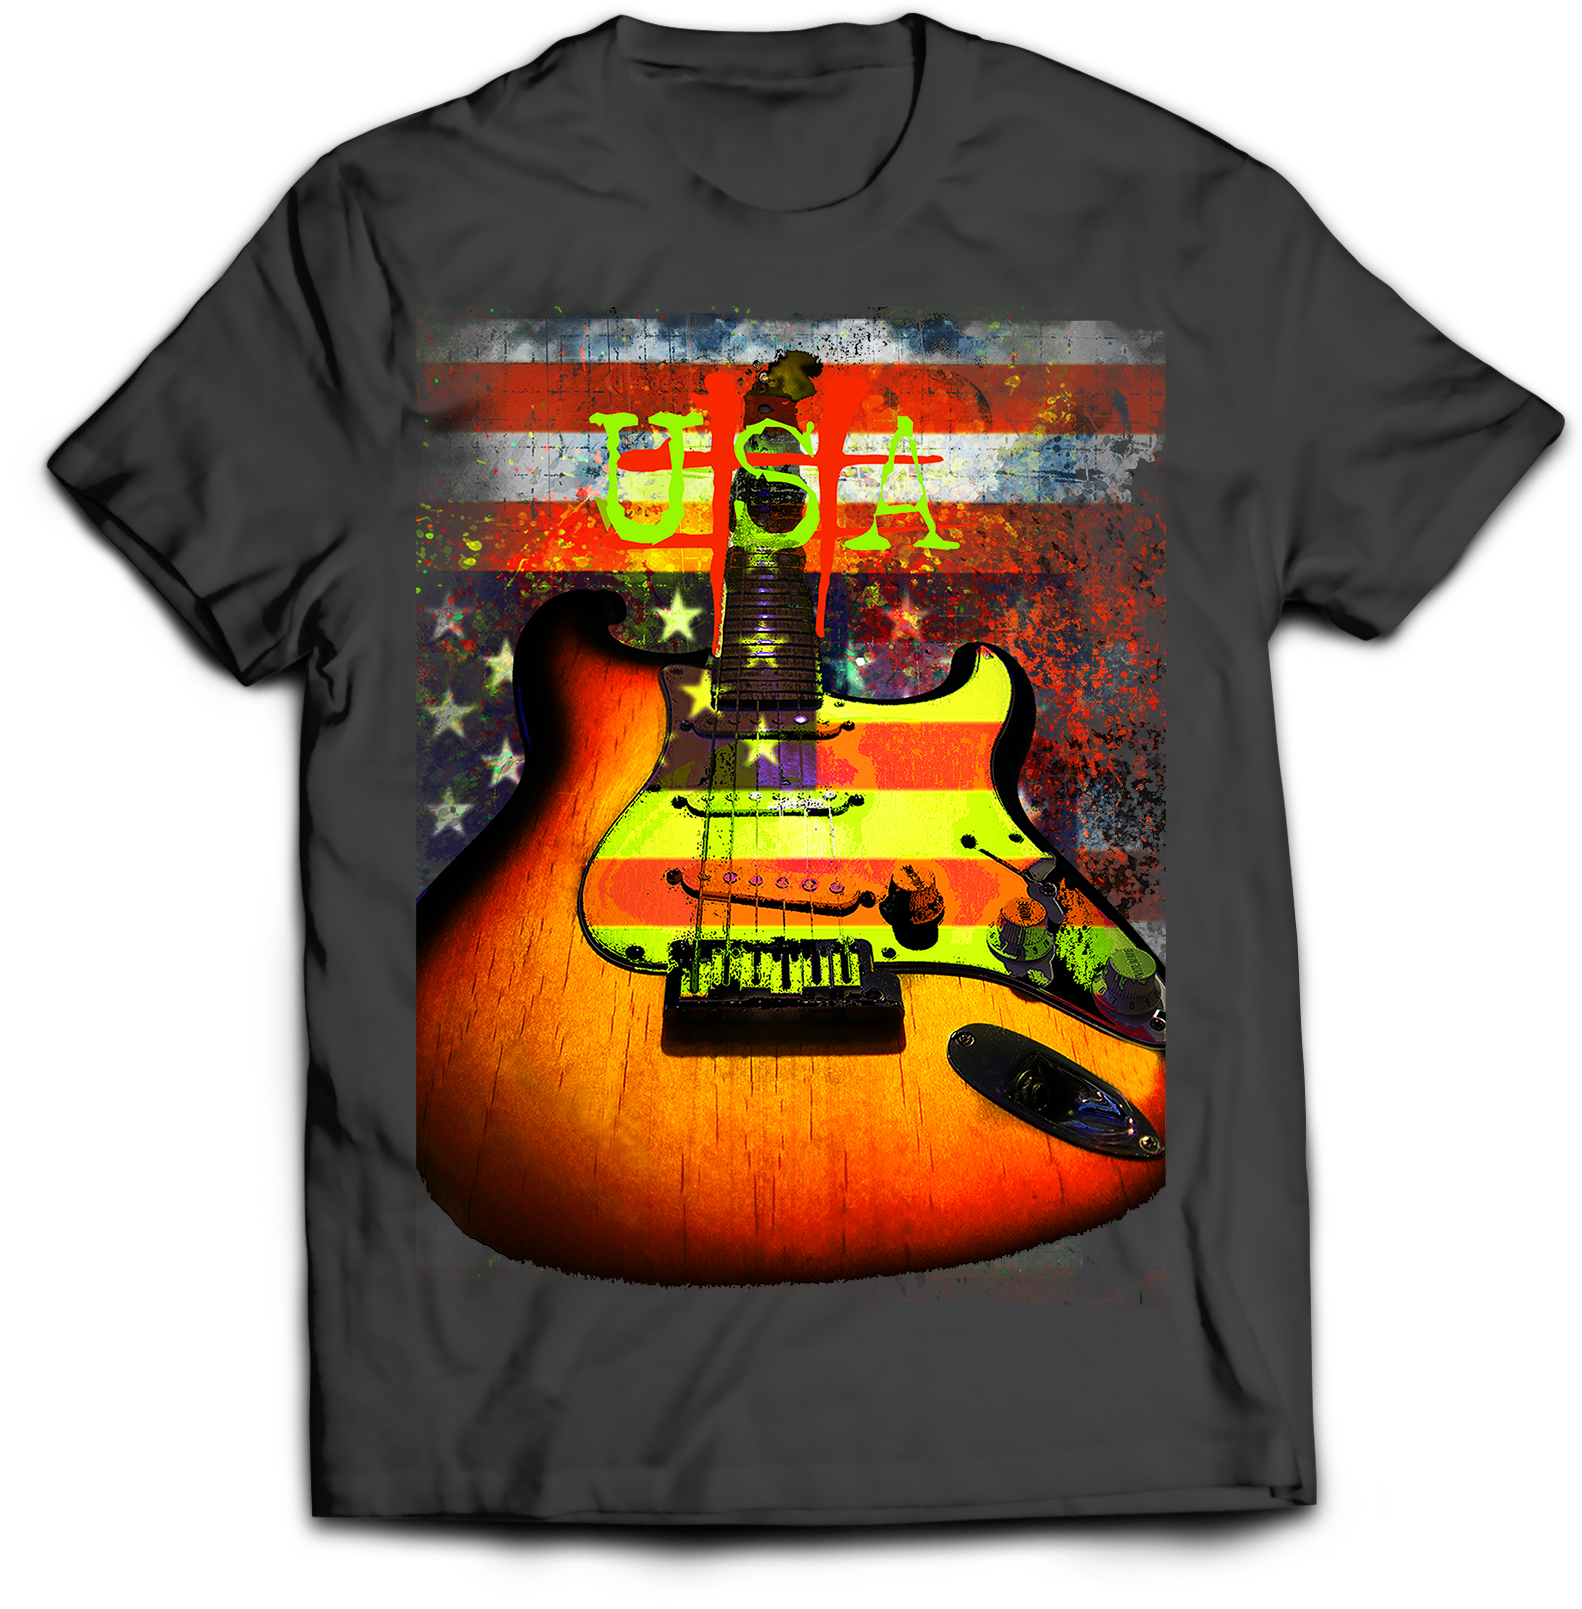 Guitar Rock Music USA Patriotic American Flag T-Shirt